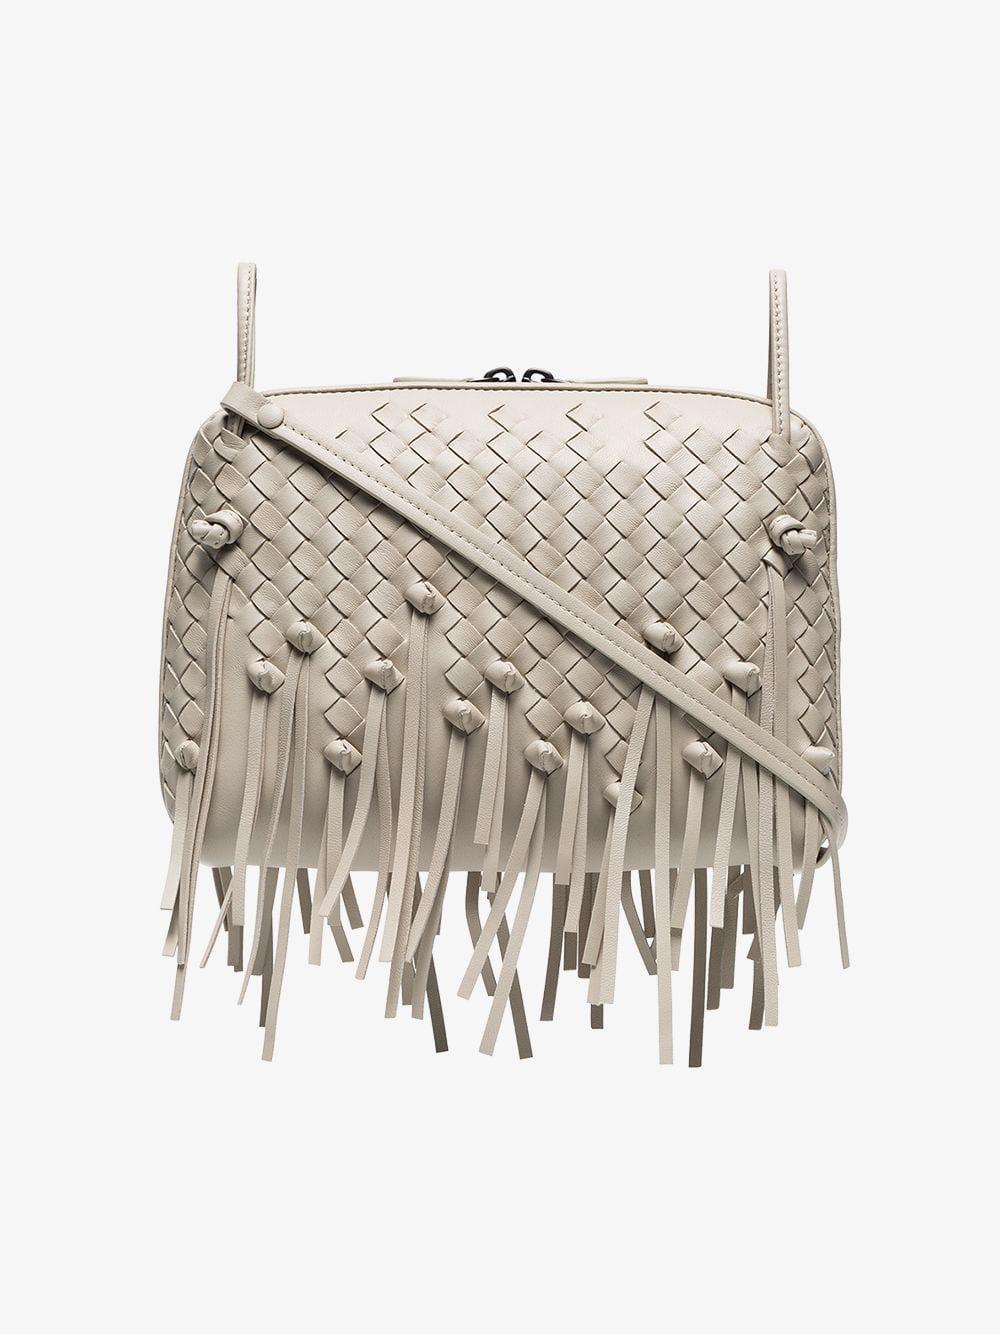 7fcb7b1b23 Bottega Veneta Cream Nodini Leather Shoulder Bag in Natural - Lyst